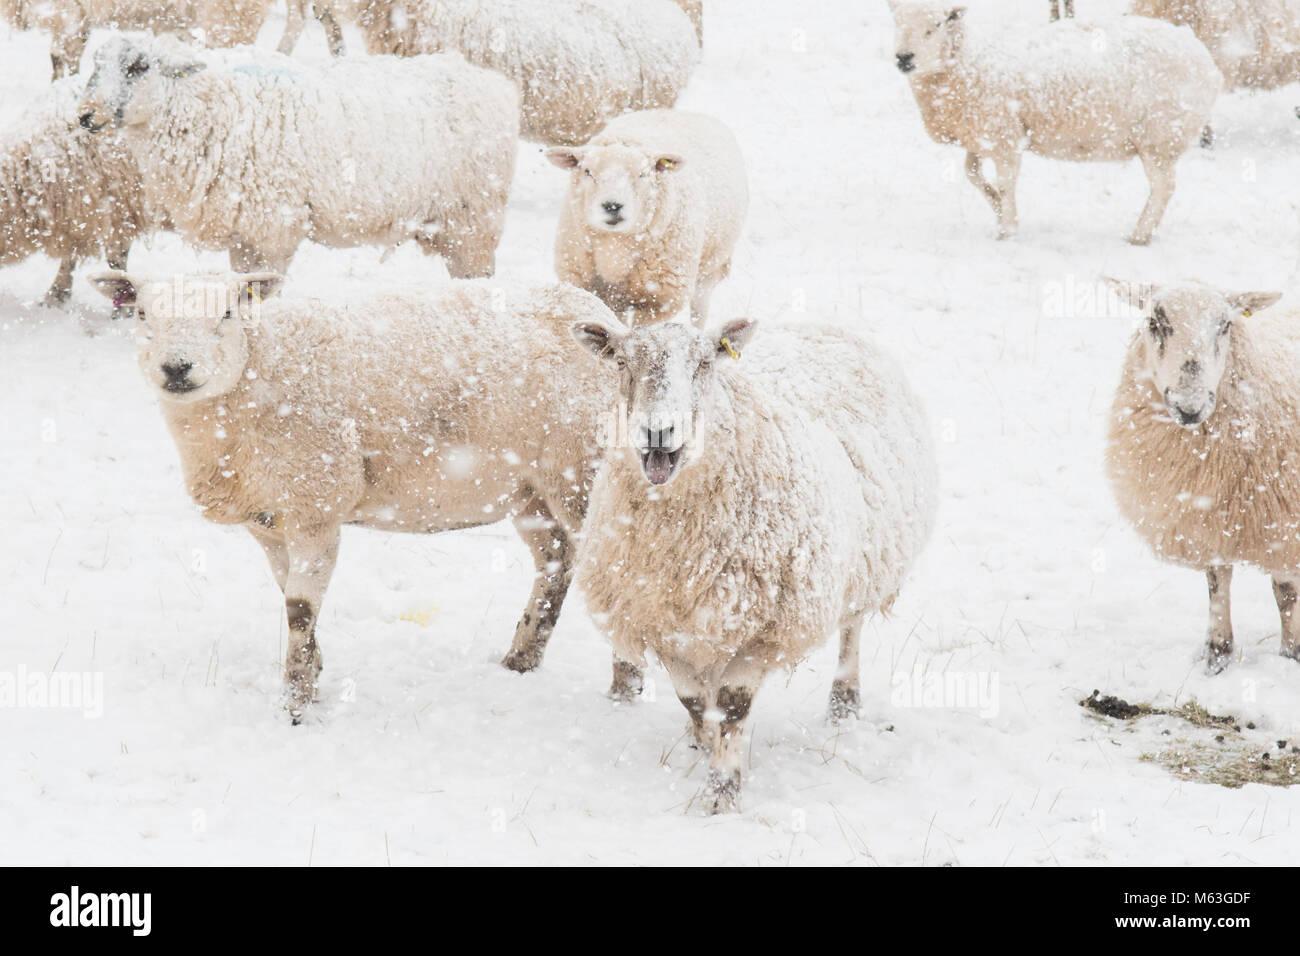 Balfron, Stirlingshire, Escocia, Reino Unido. 28 Feb, 2018. El clima del Reino Unido - ovejas esperando para alimentos Imagen De Stock